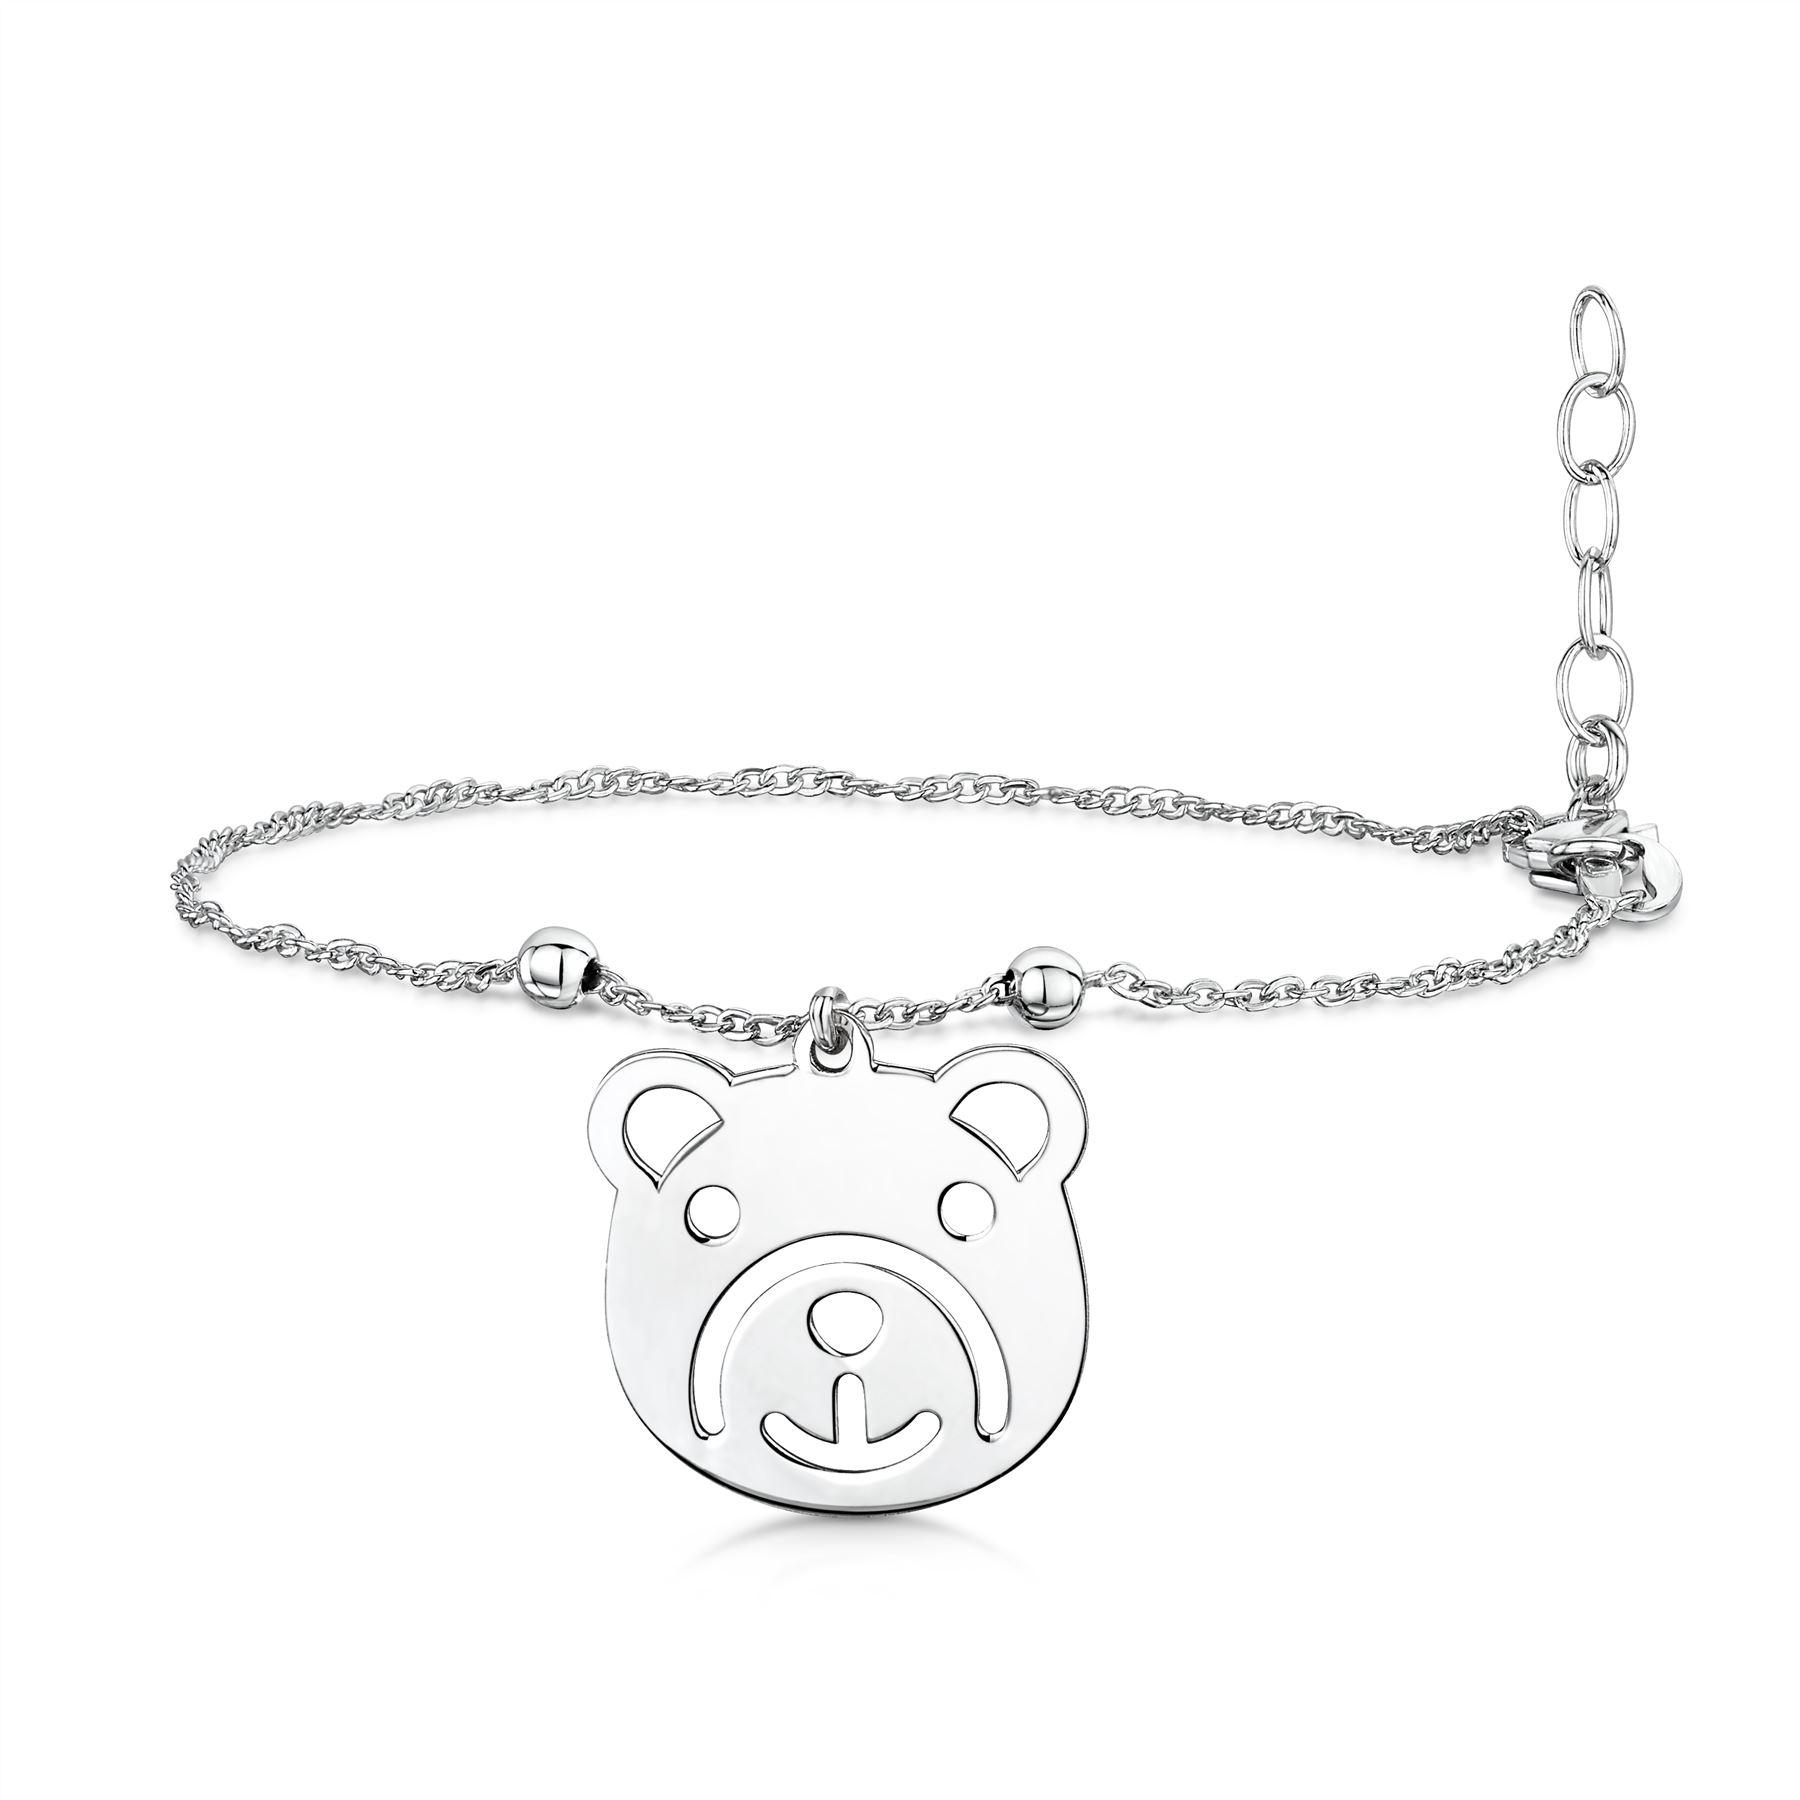 Amberta-Jewelry-925-Sterling-Silver-Adjustable-Bracelet-Italian-Bangle-for-Women thumbnail 30